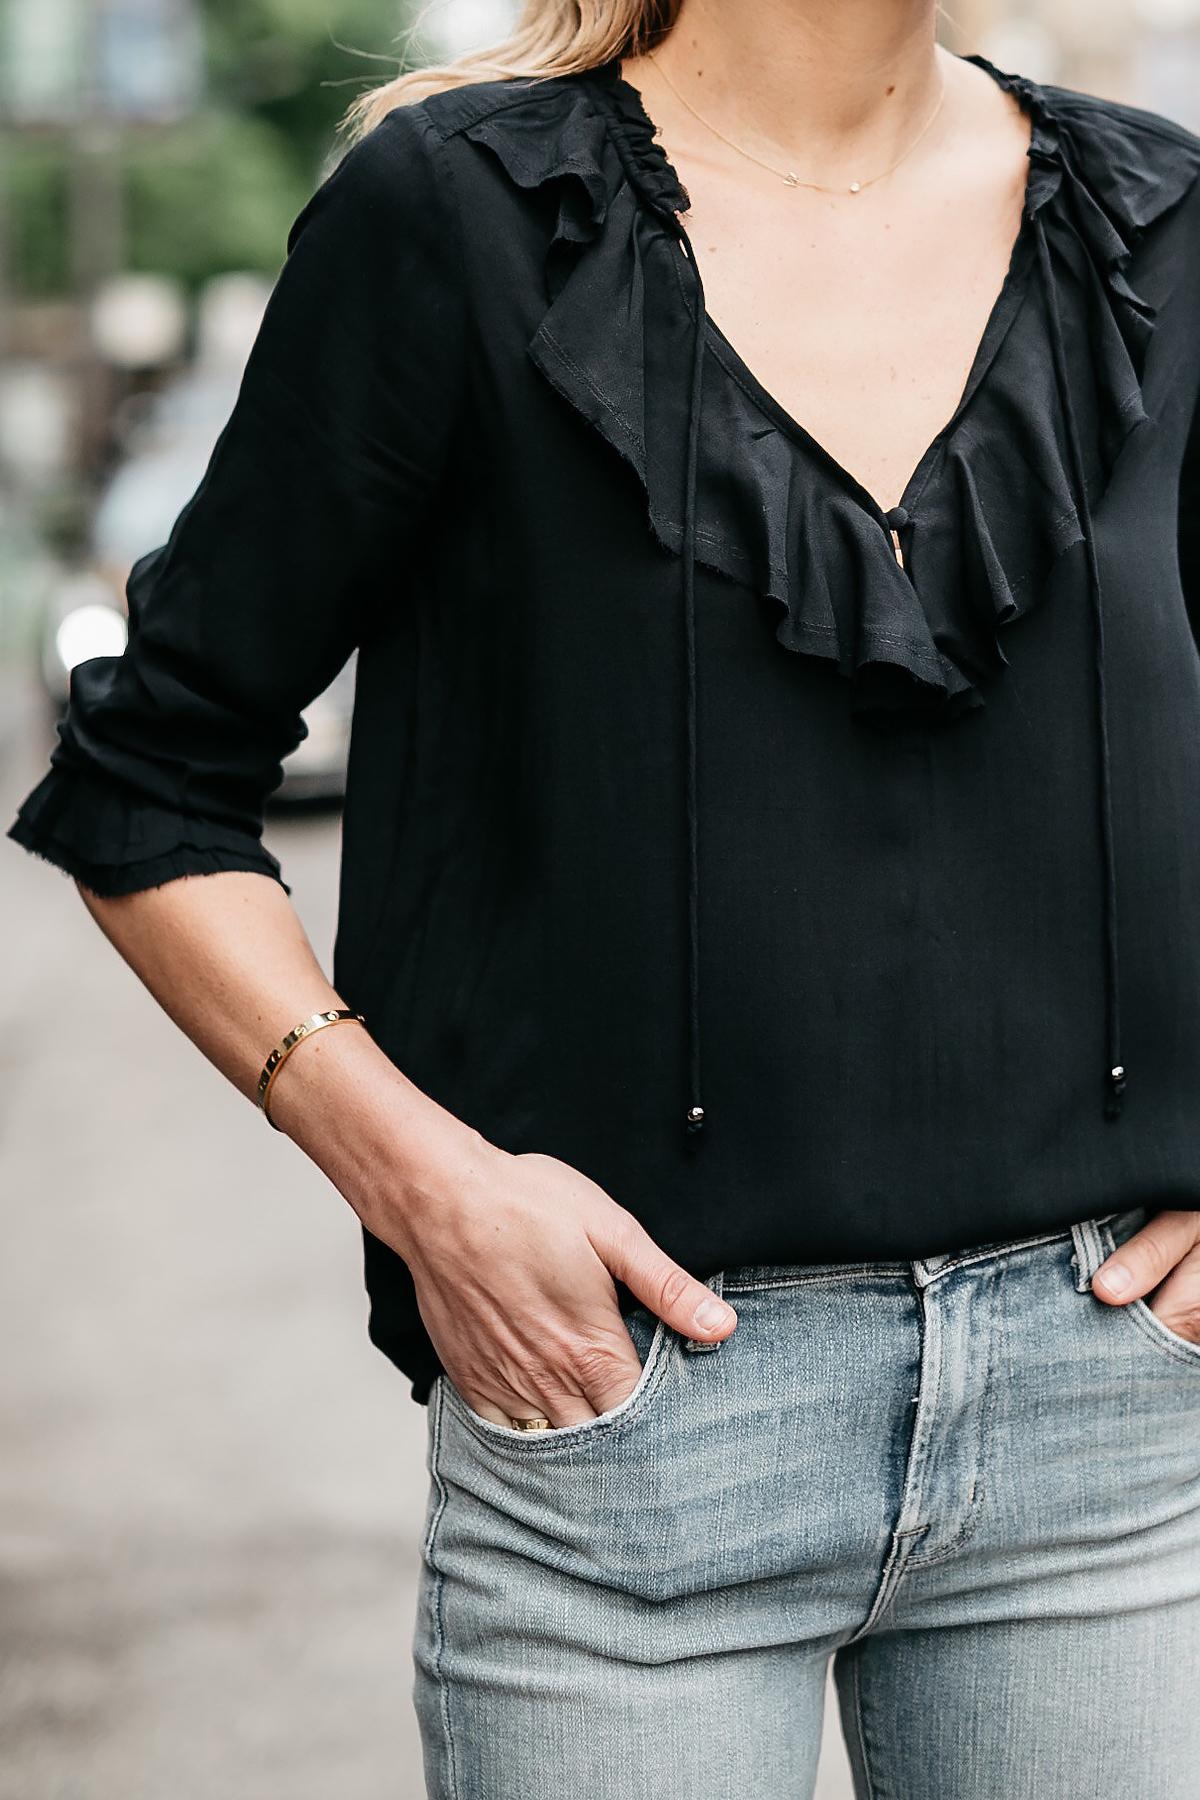 Woman Wearing Black Ruffle Top Fashion Jackson Dallas Blogger Fashion Blogger Street Style